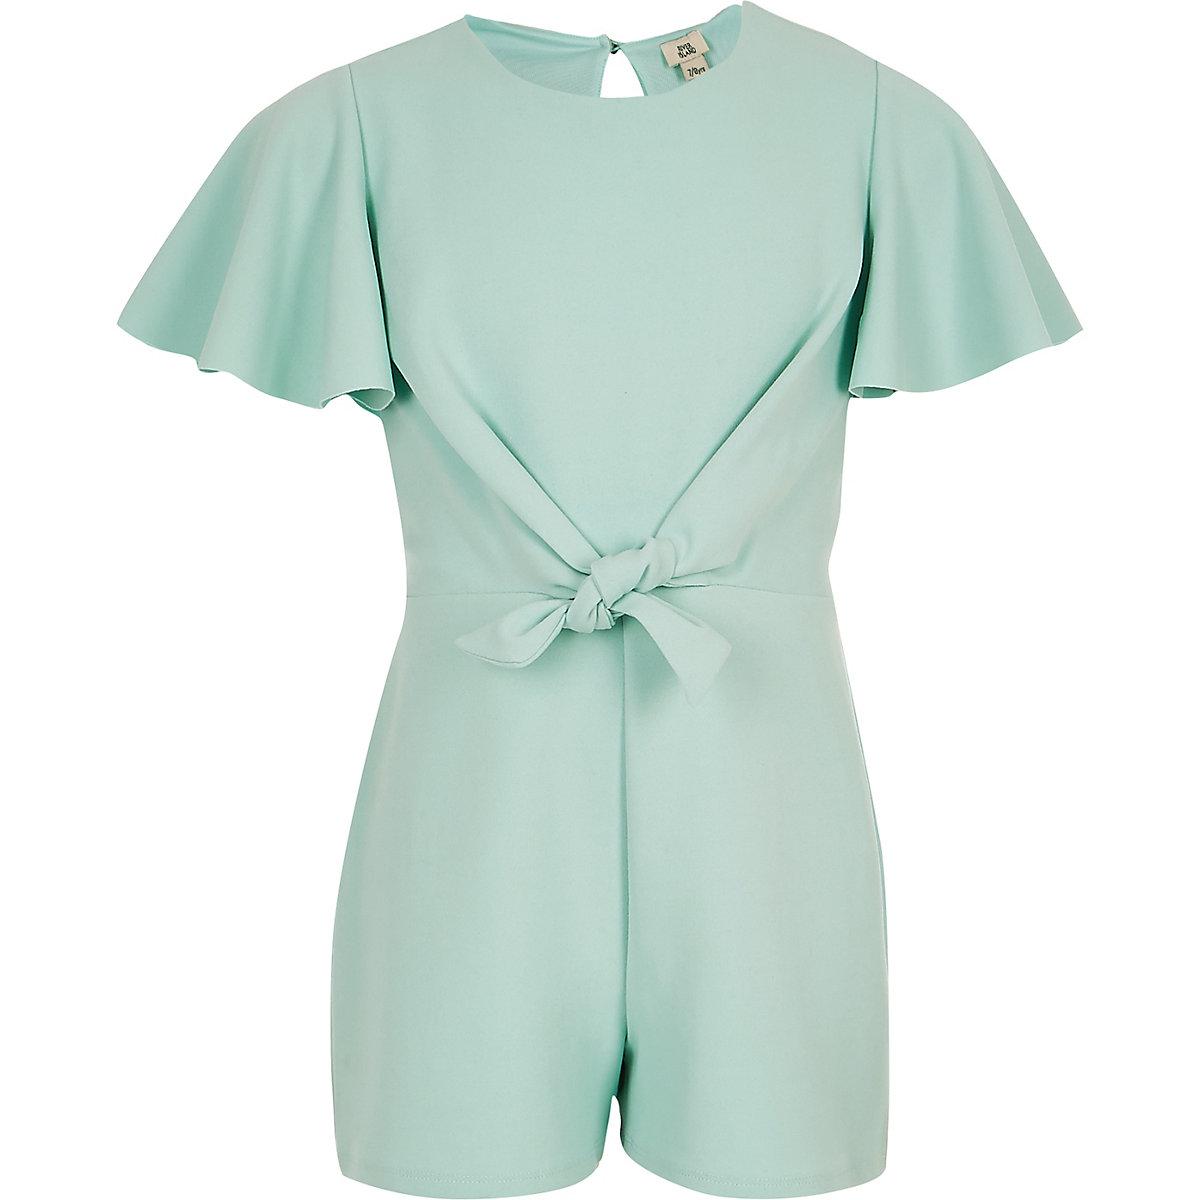 Girls green tie front playsuit